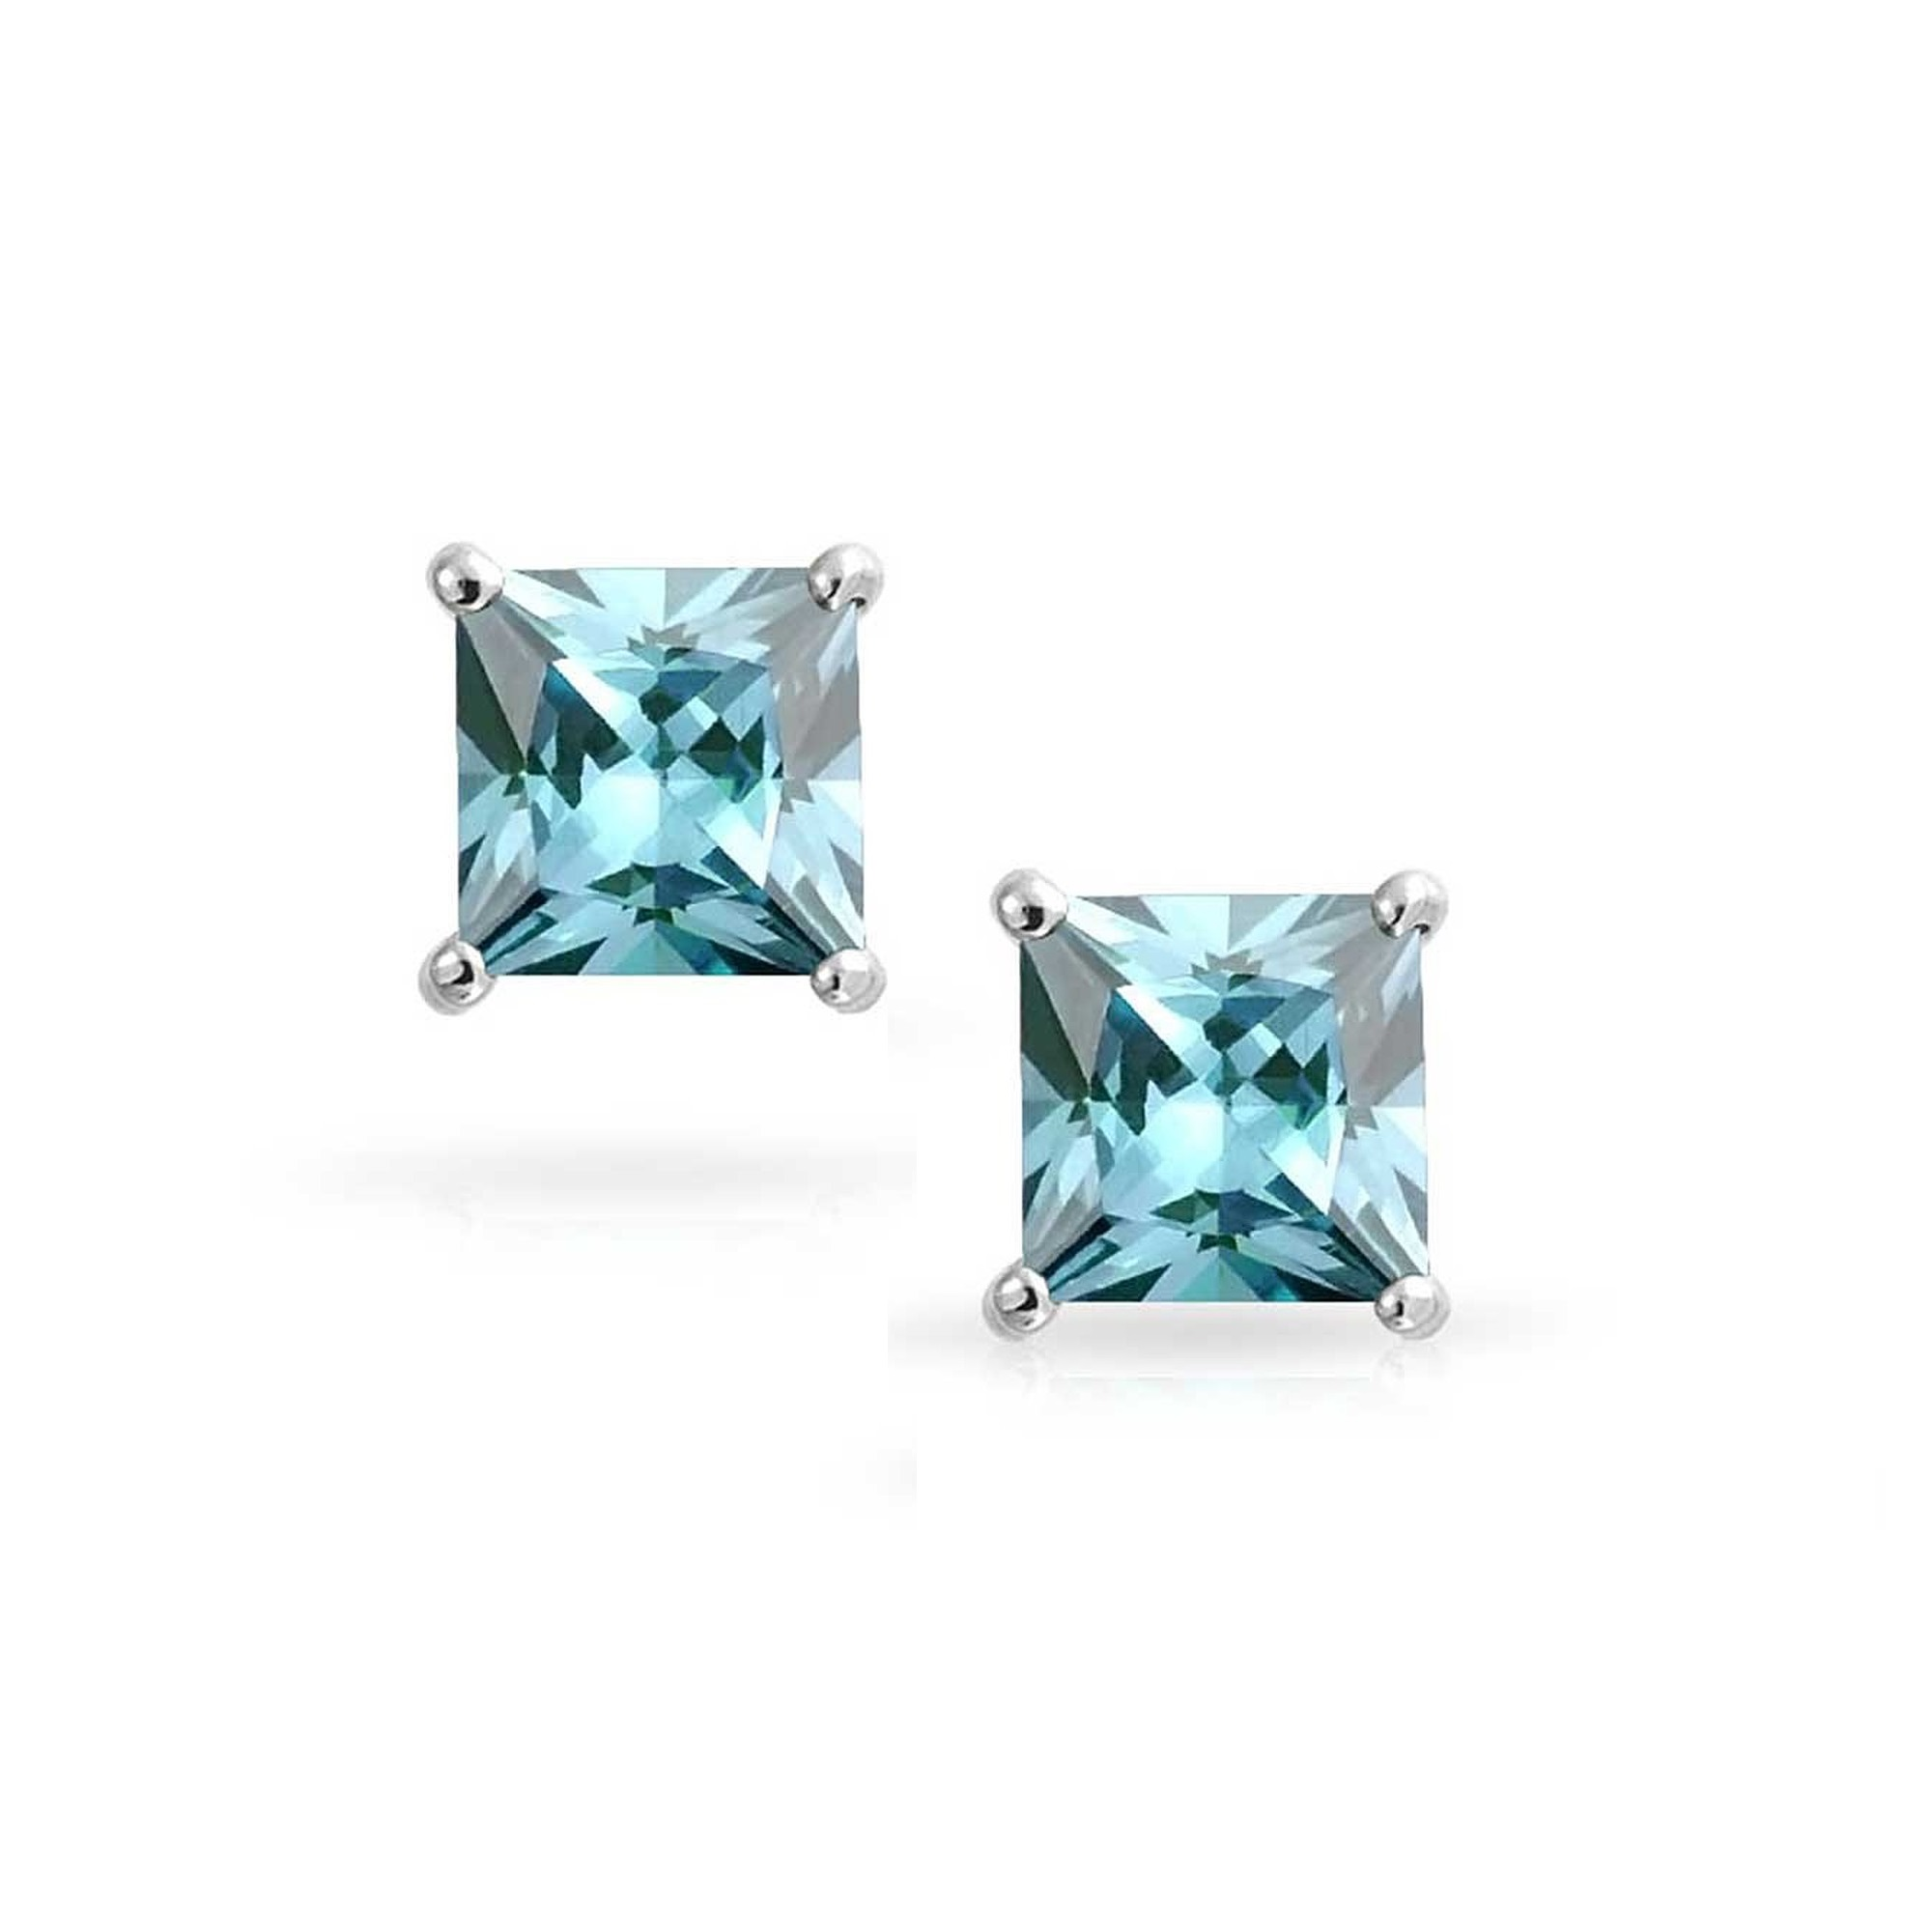 6b95fa0f7 Pori - Jewelers 14K Solid White Gold Birthstone Princess-cut Stud Earrings  made with Crystals Swarovski-MAR BOXED - Walmart.com